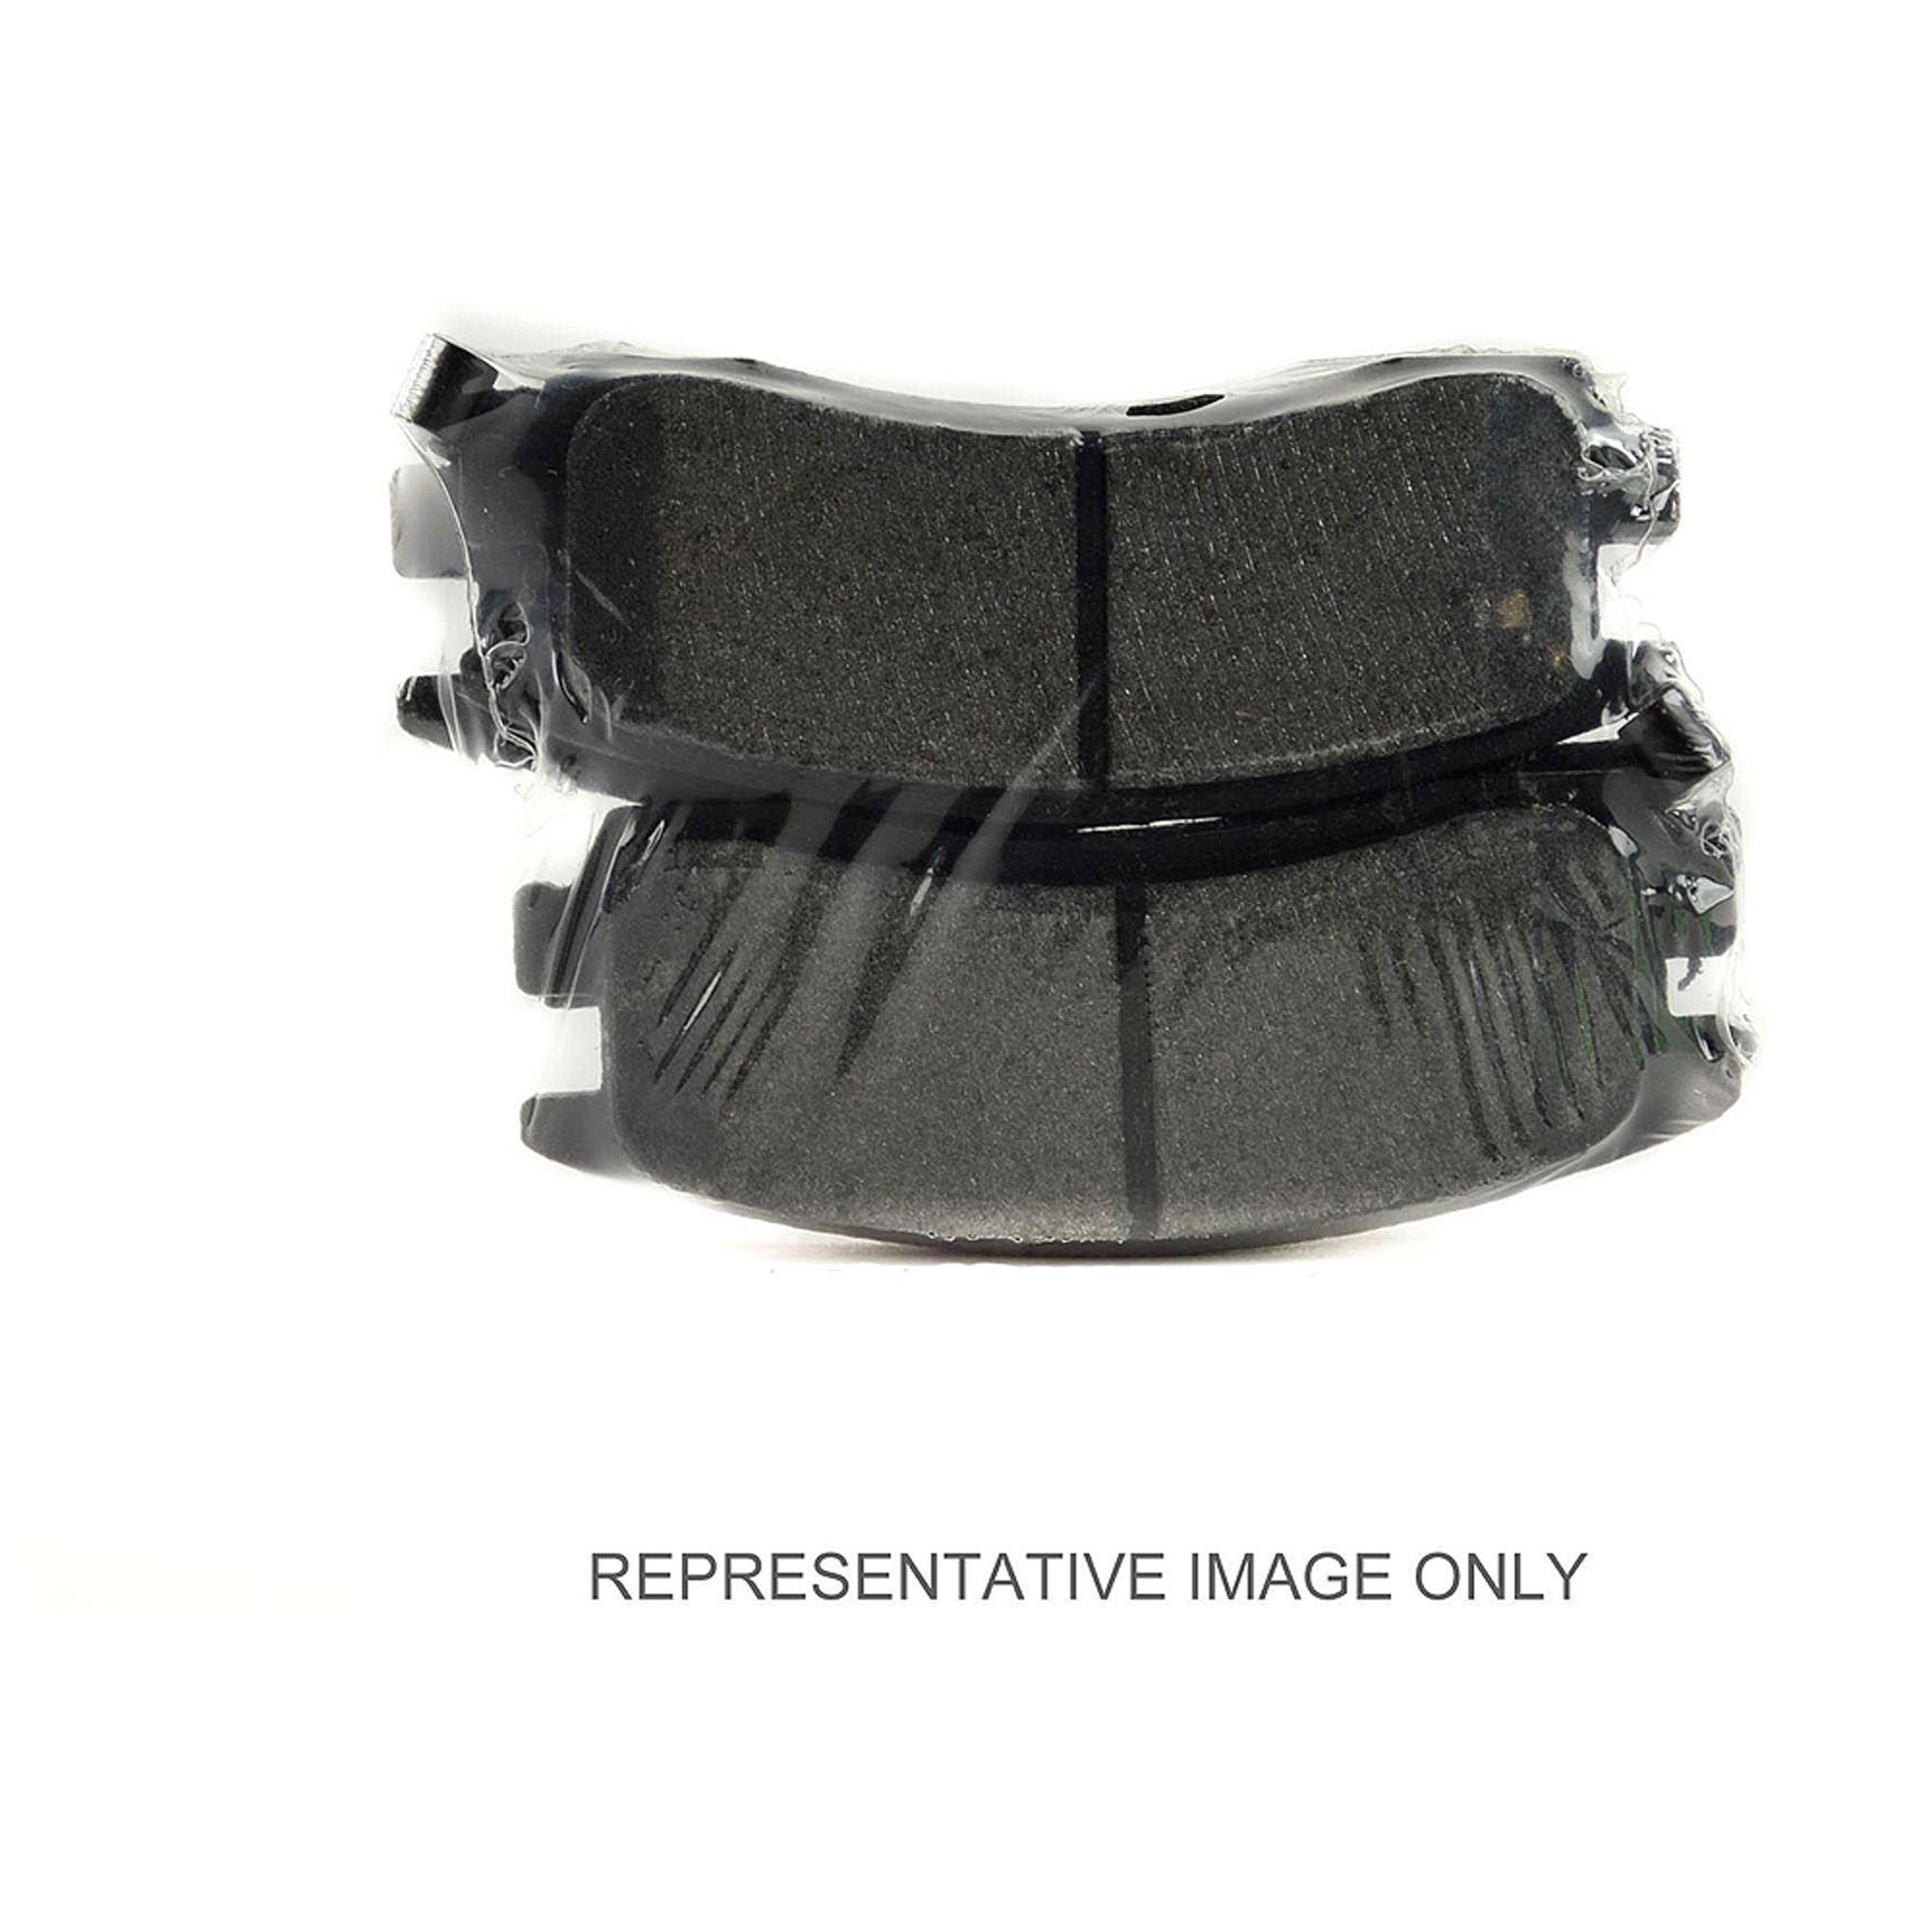 Bendix Brake Pad Kit, #Mrd507